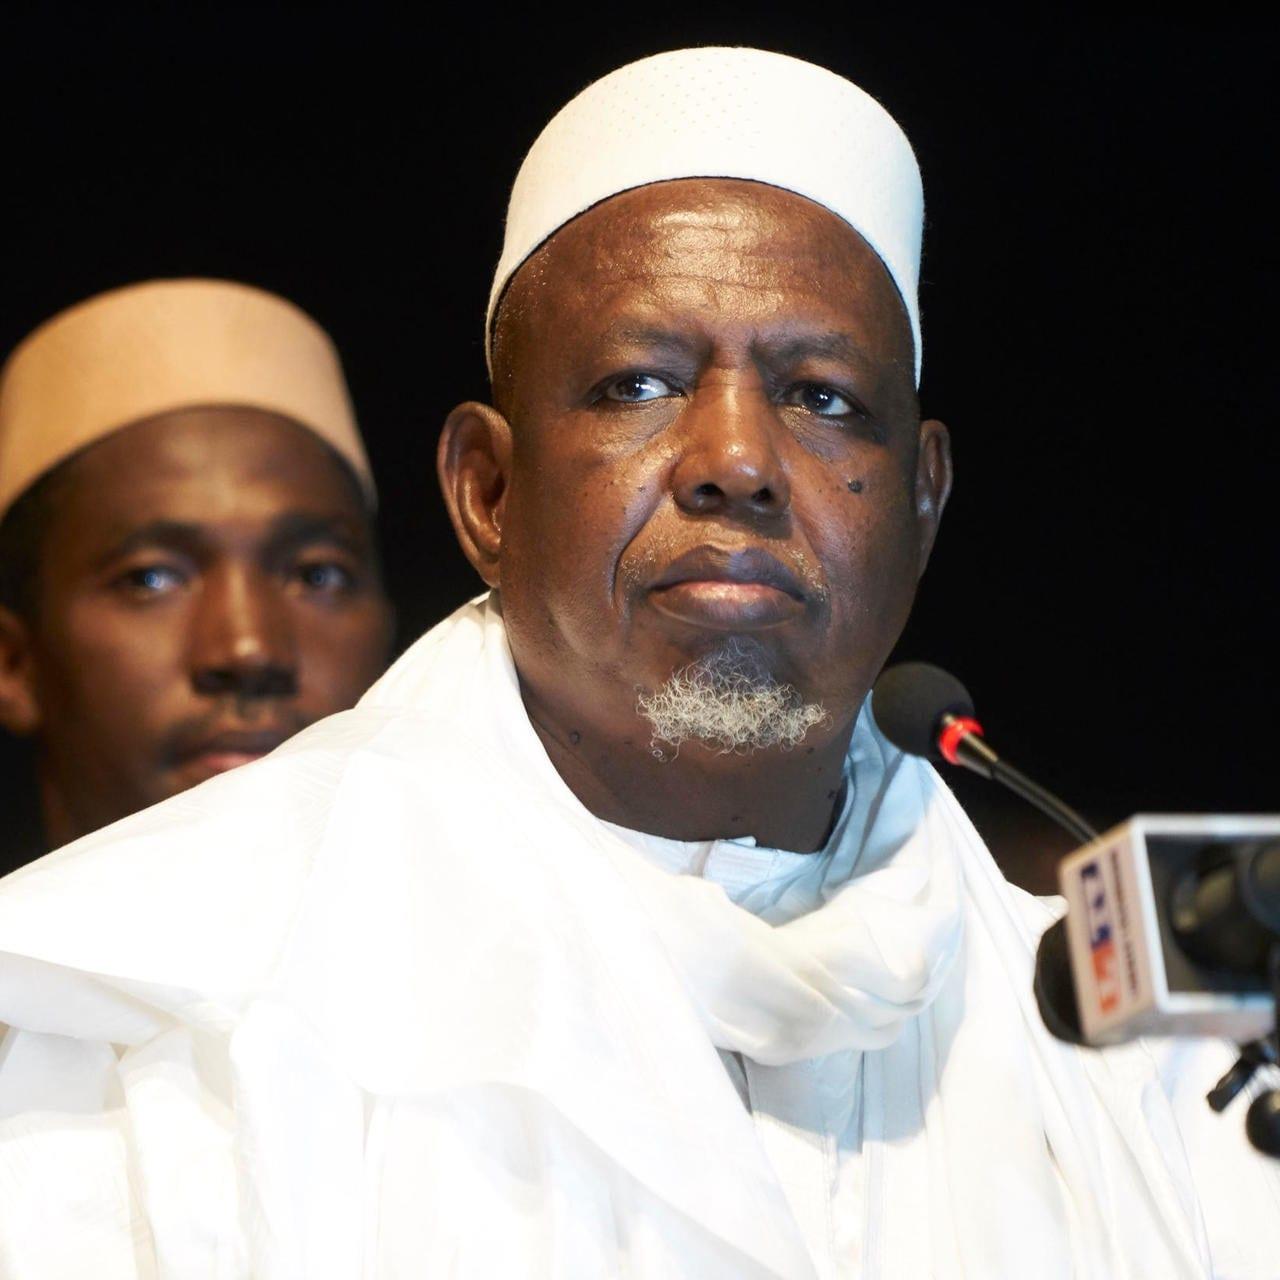 Mali : l'imam Dicko met en garde la junte militaire